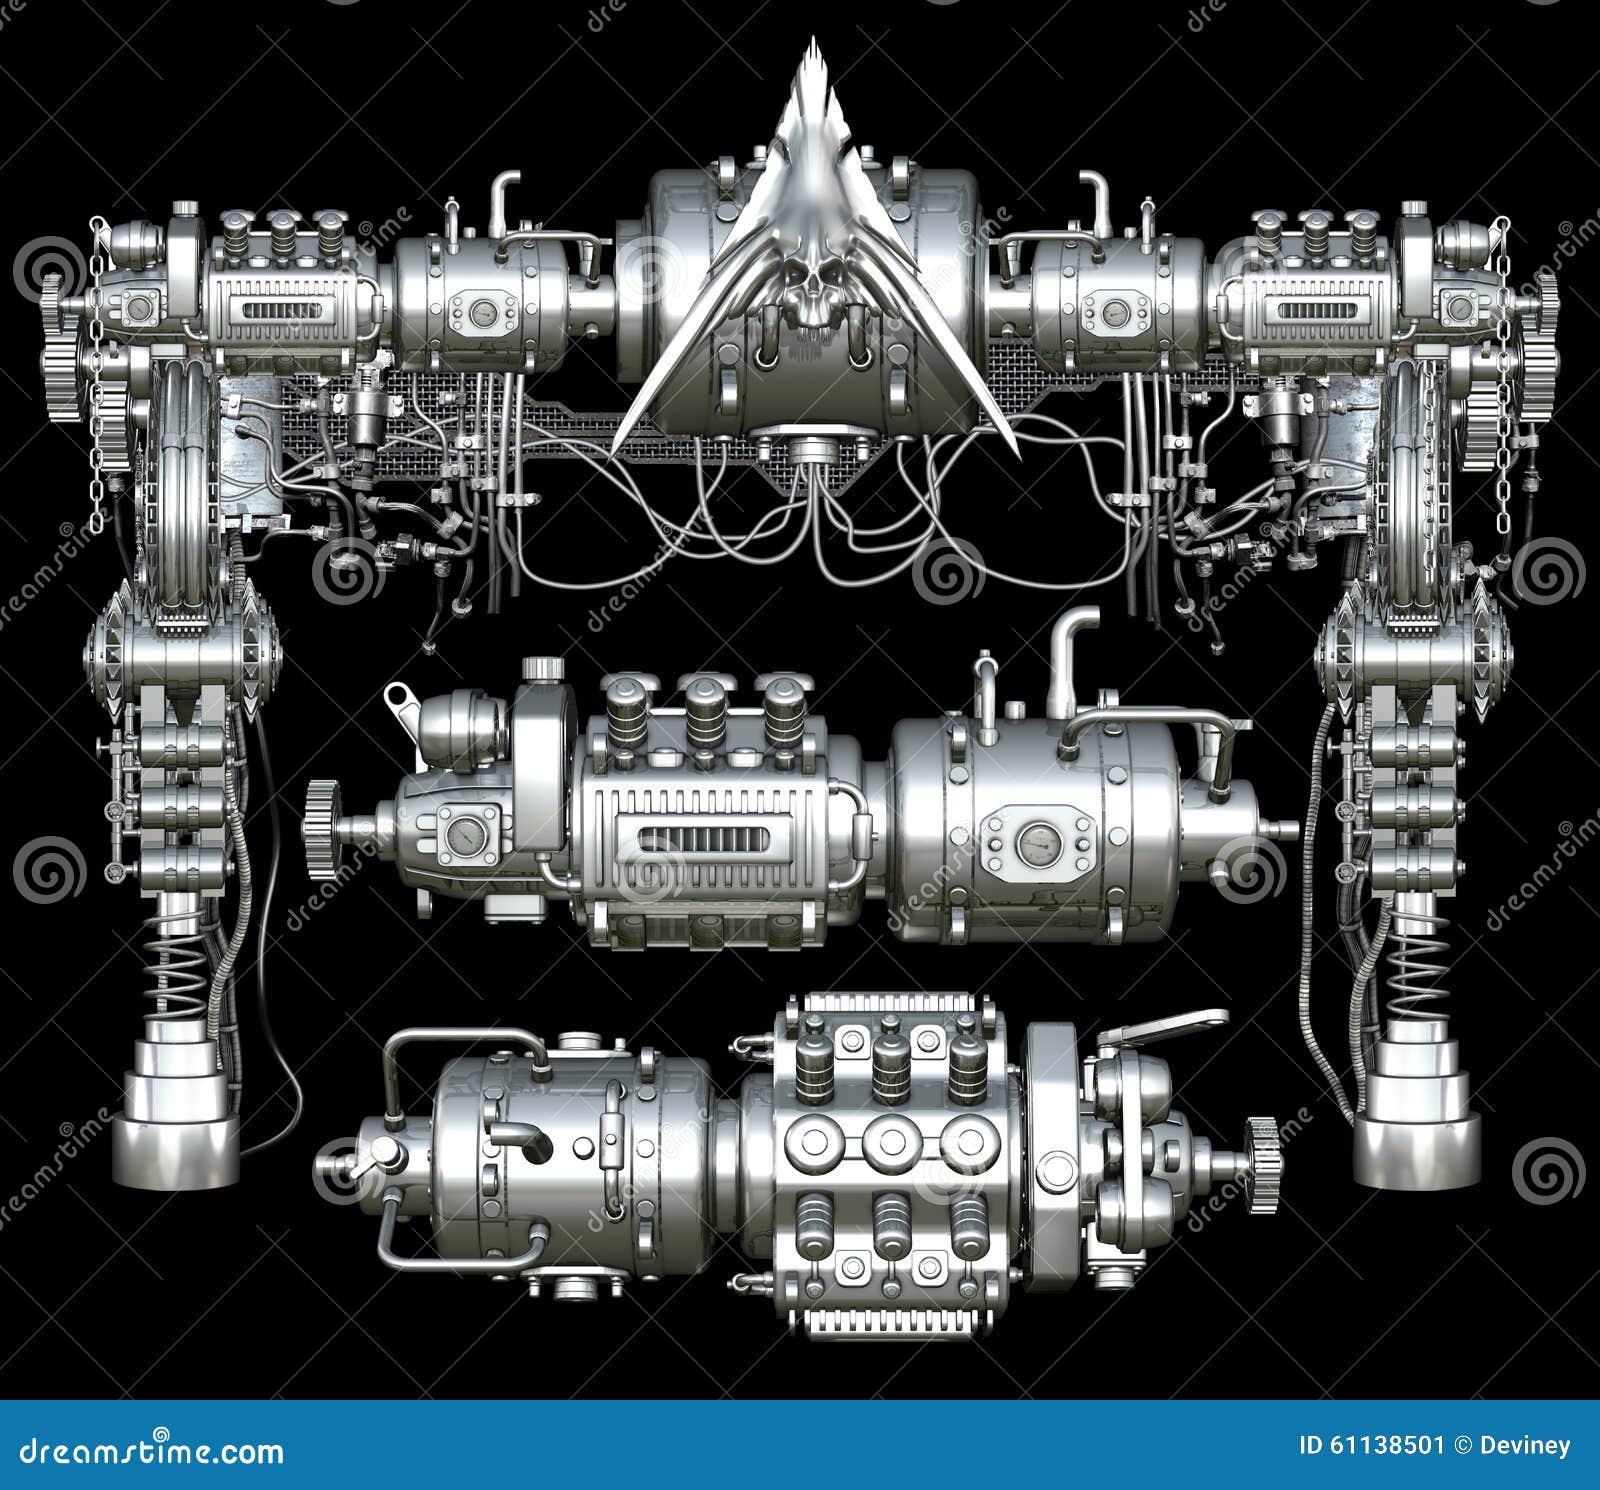 Intricate Engine Diagram Bmw 750li Fuse Box Location – Intricate Engine Diagram